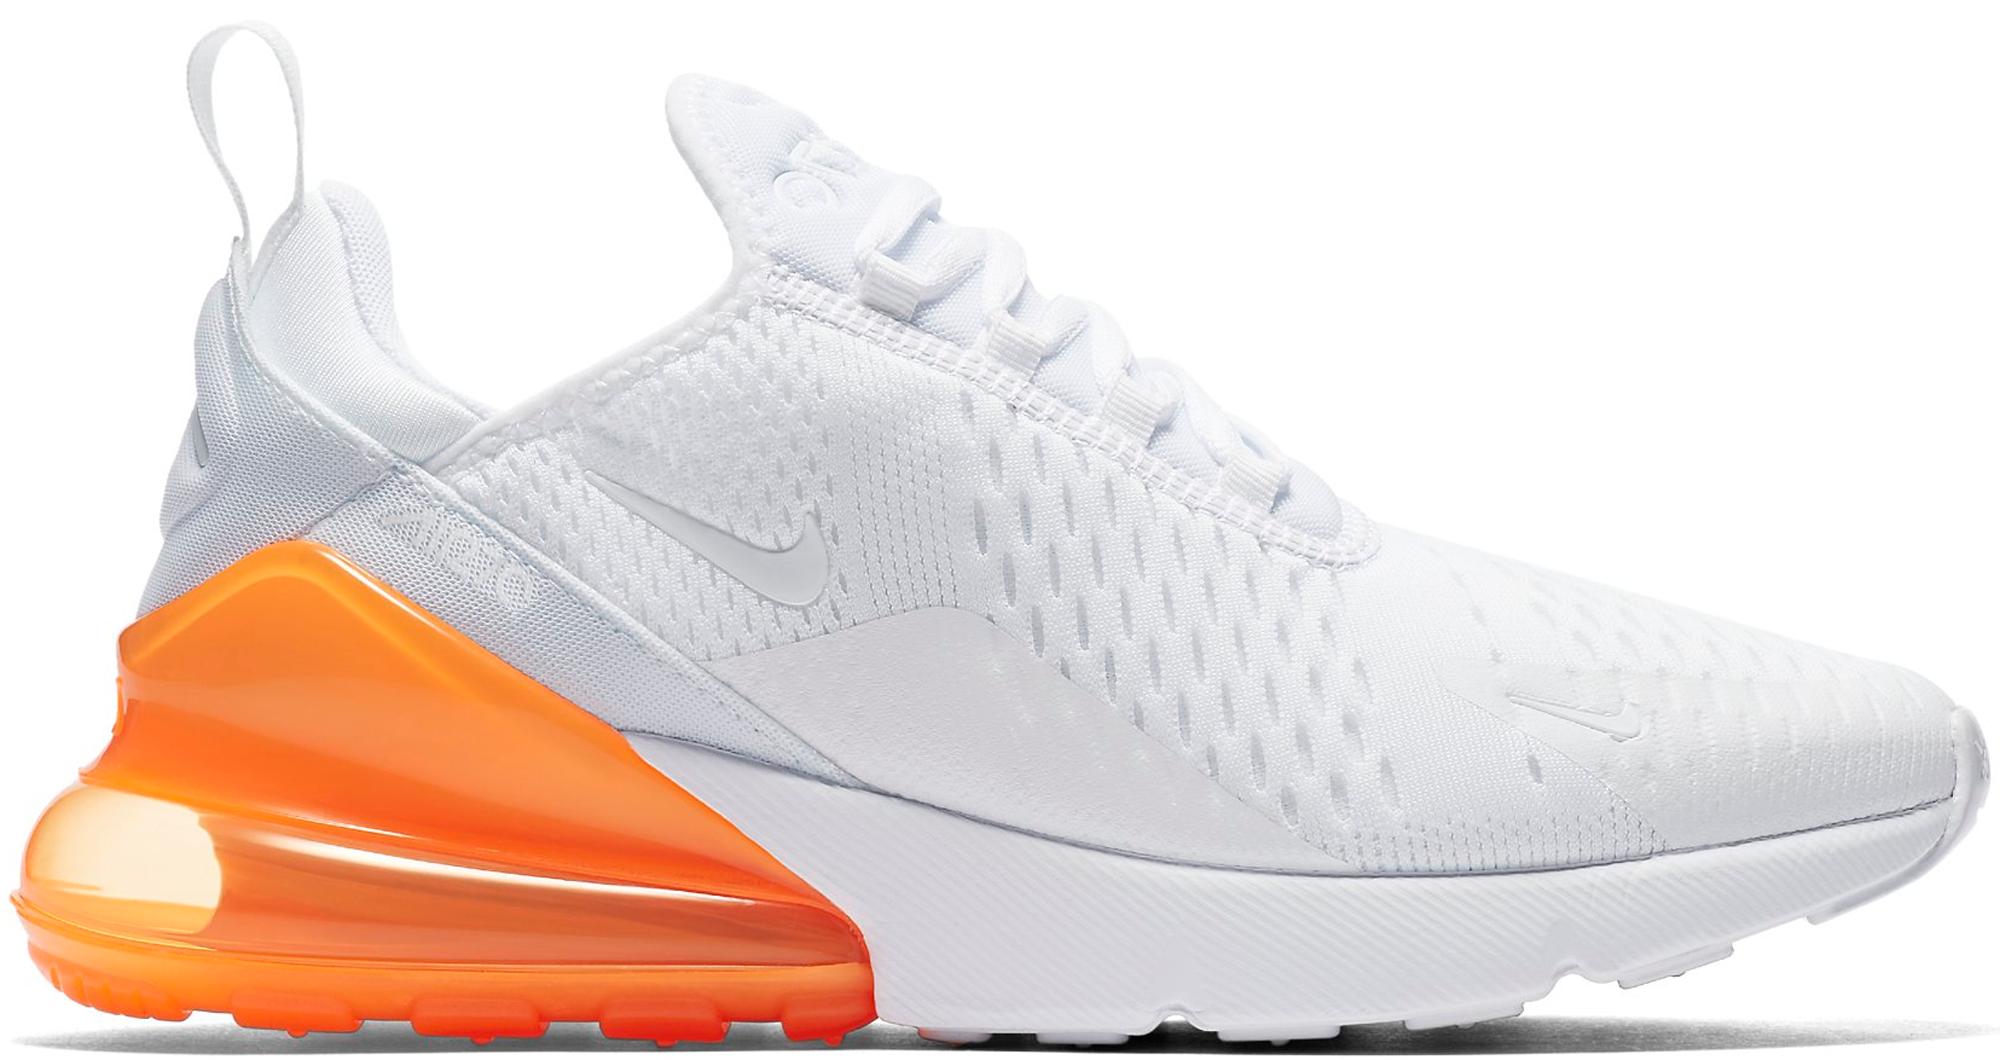 Nike Air Max 270 White Pack (Total